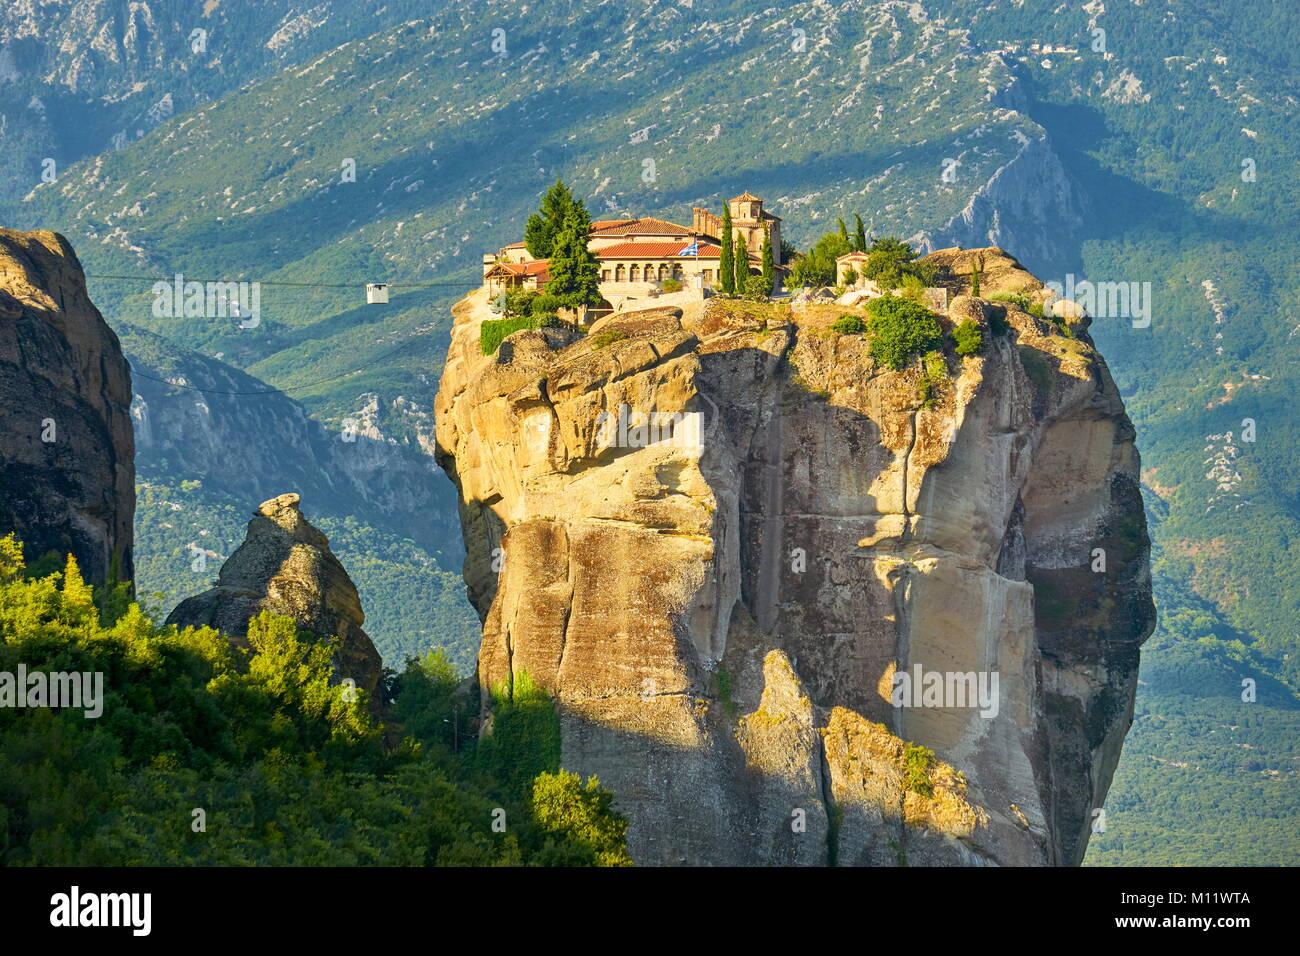 Holy Trinity Monastery at Meteora, Greece - Stock Image